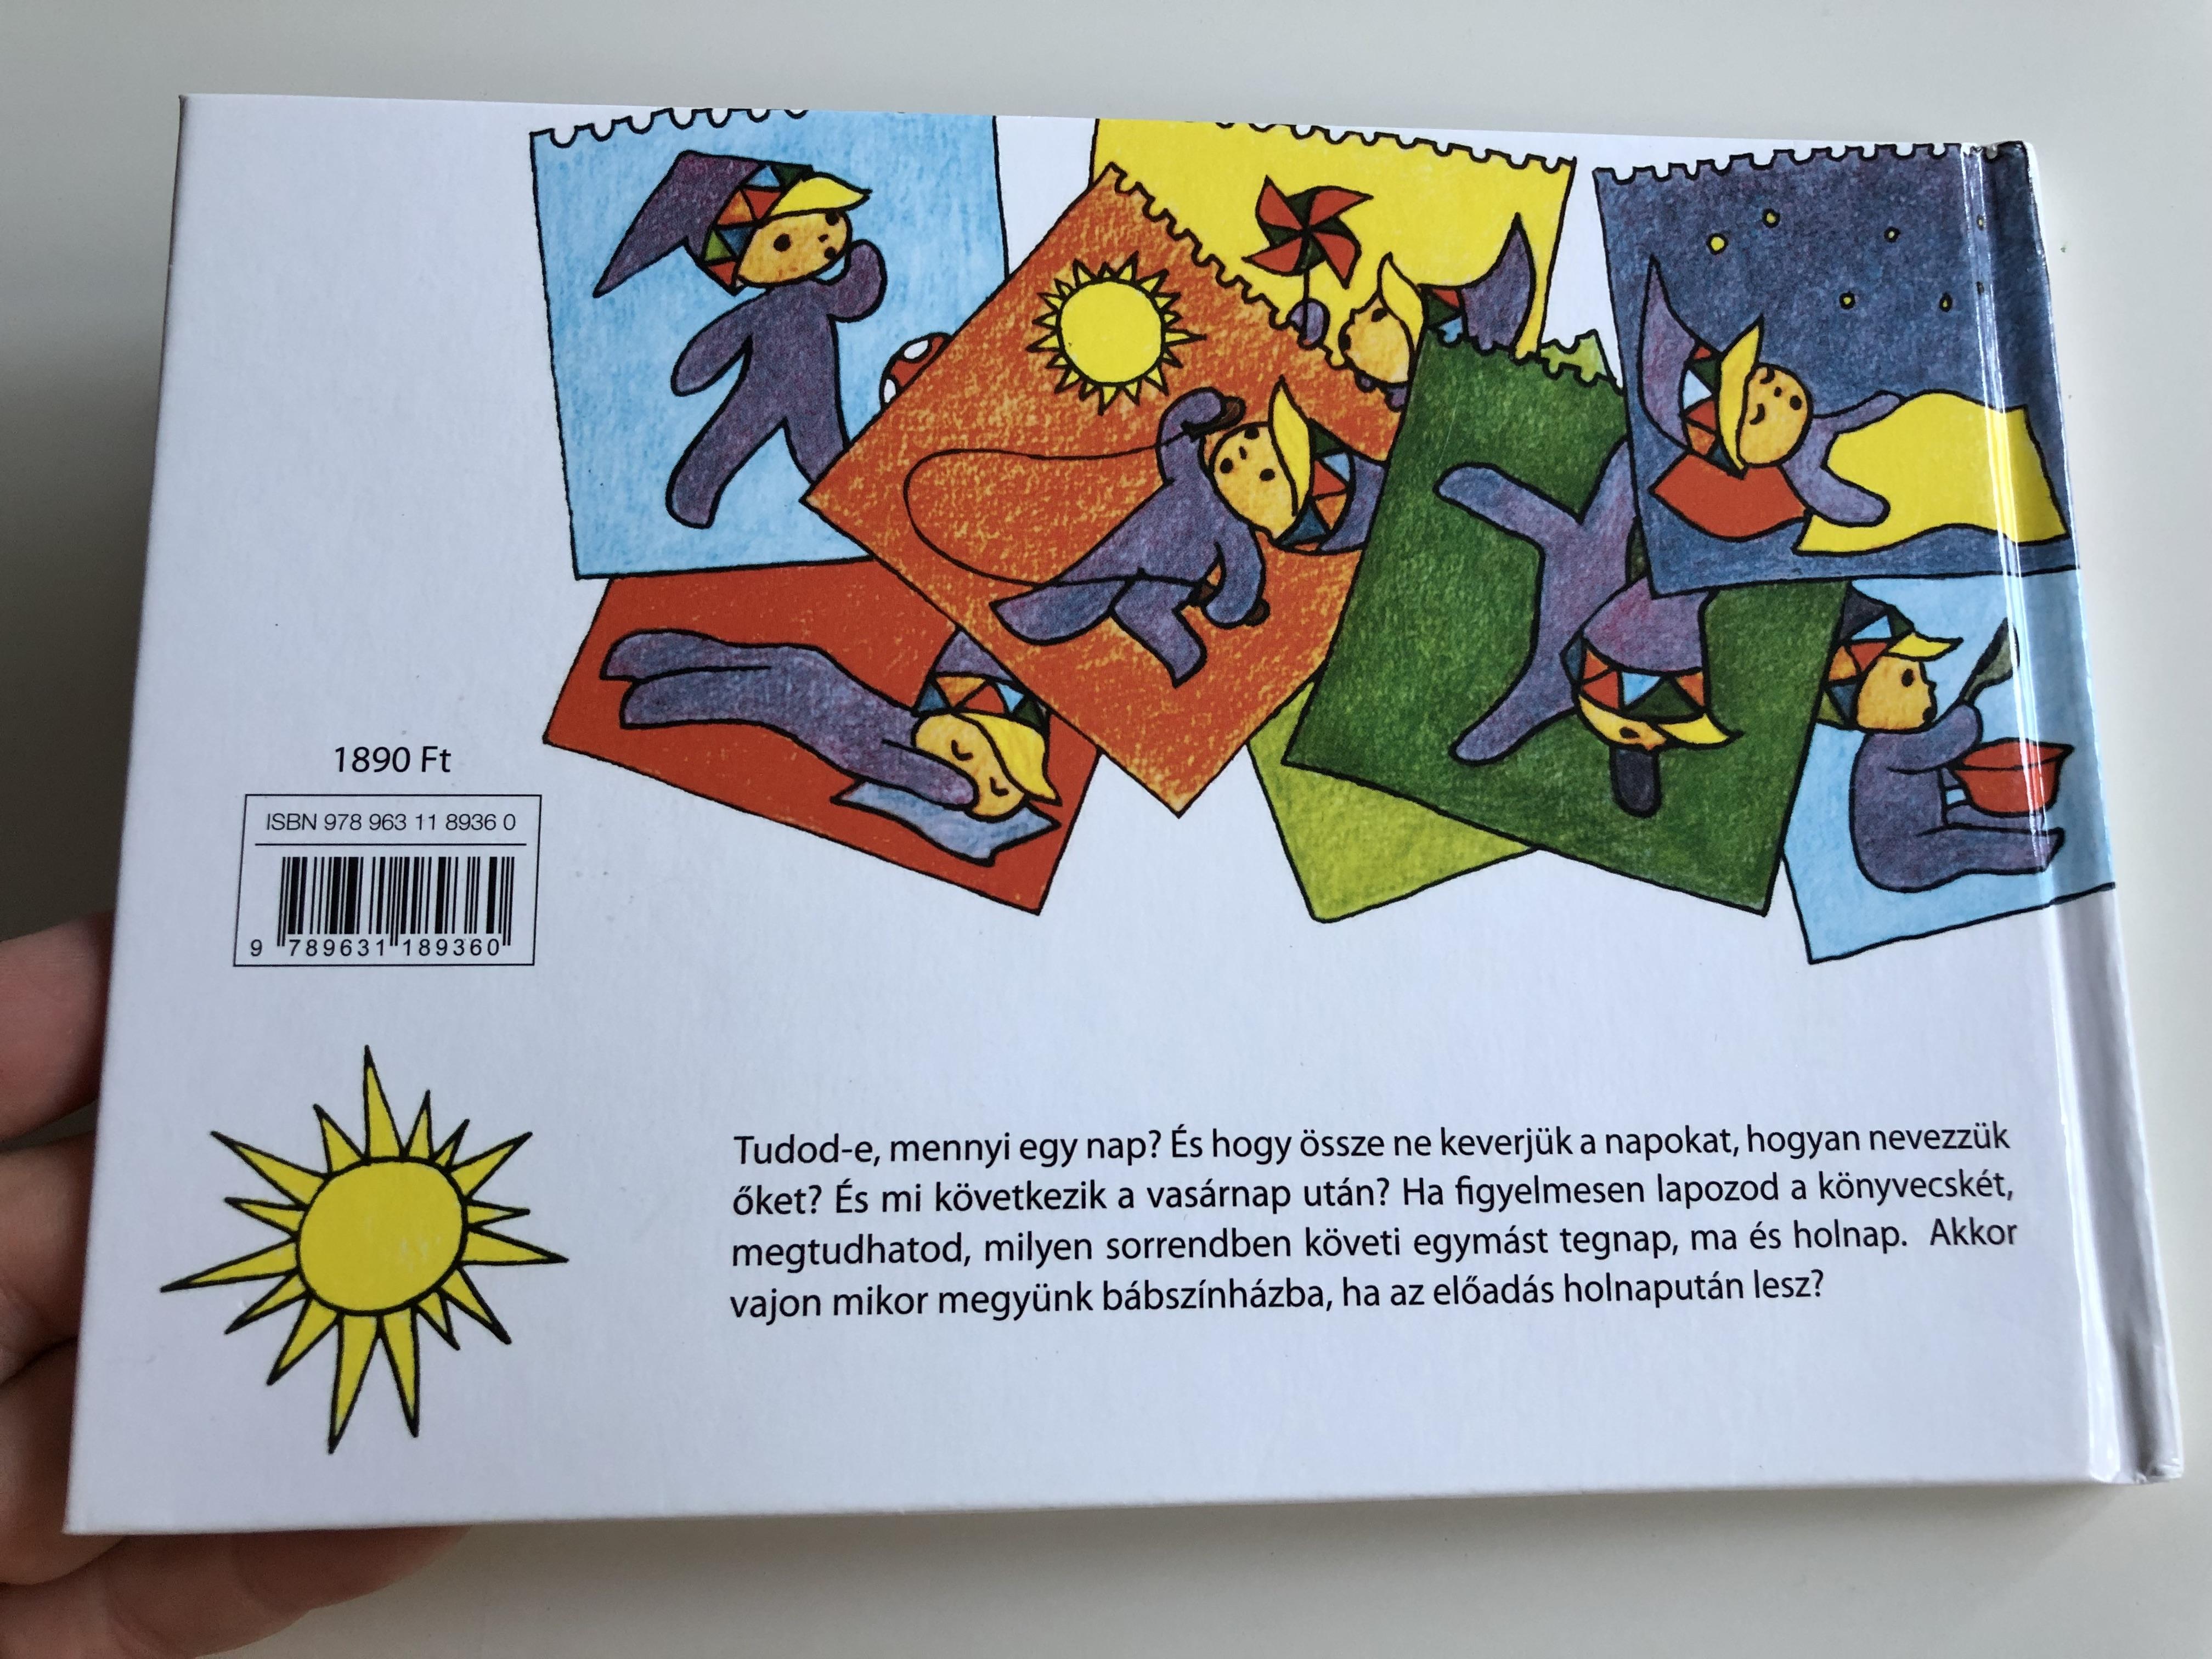 tegnap-ma-holnap-by-mar-k-veronika-felelget-s-k-nyv-hungarian-language-children-s-book-about-weekdays-m-ra-k-nyvkiad-2011-12-.jpg